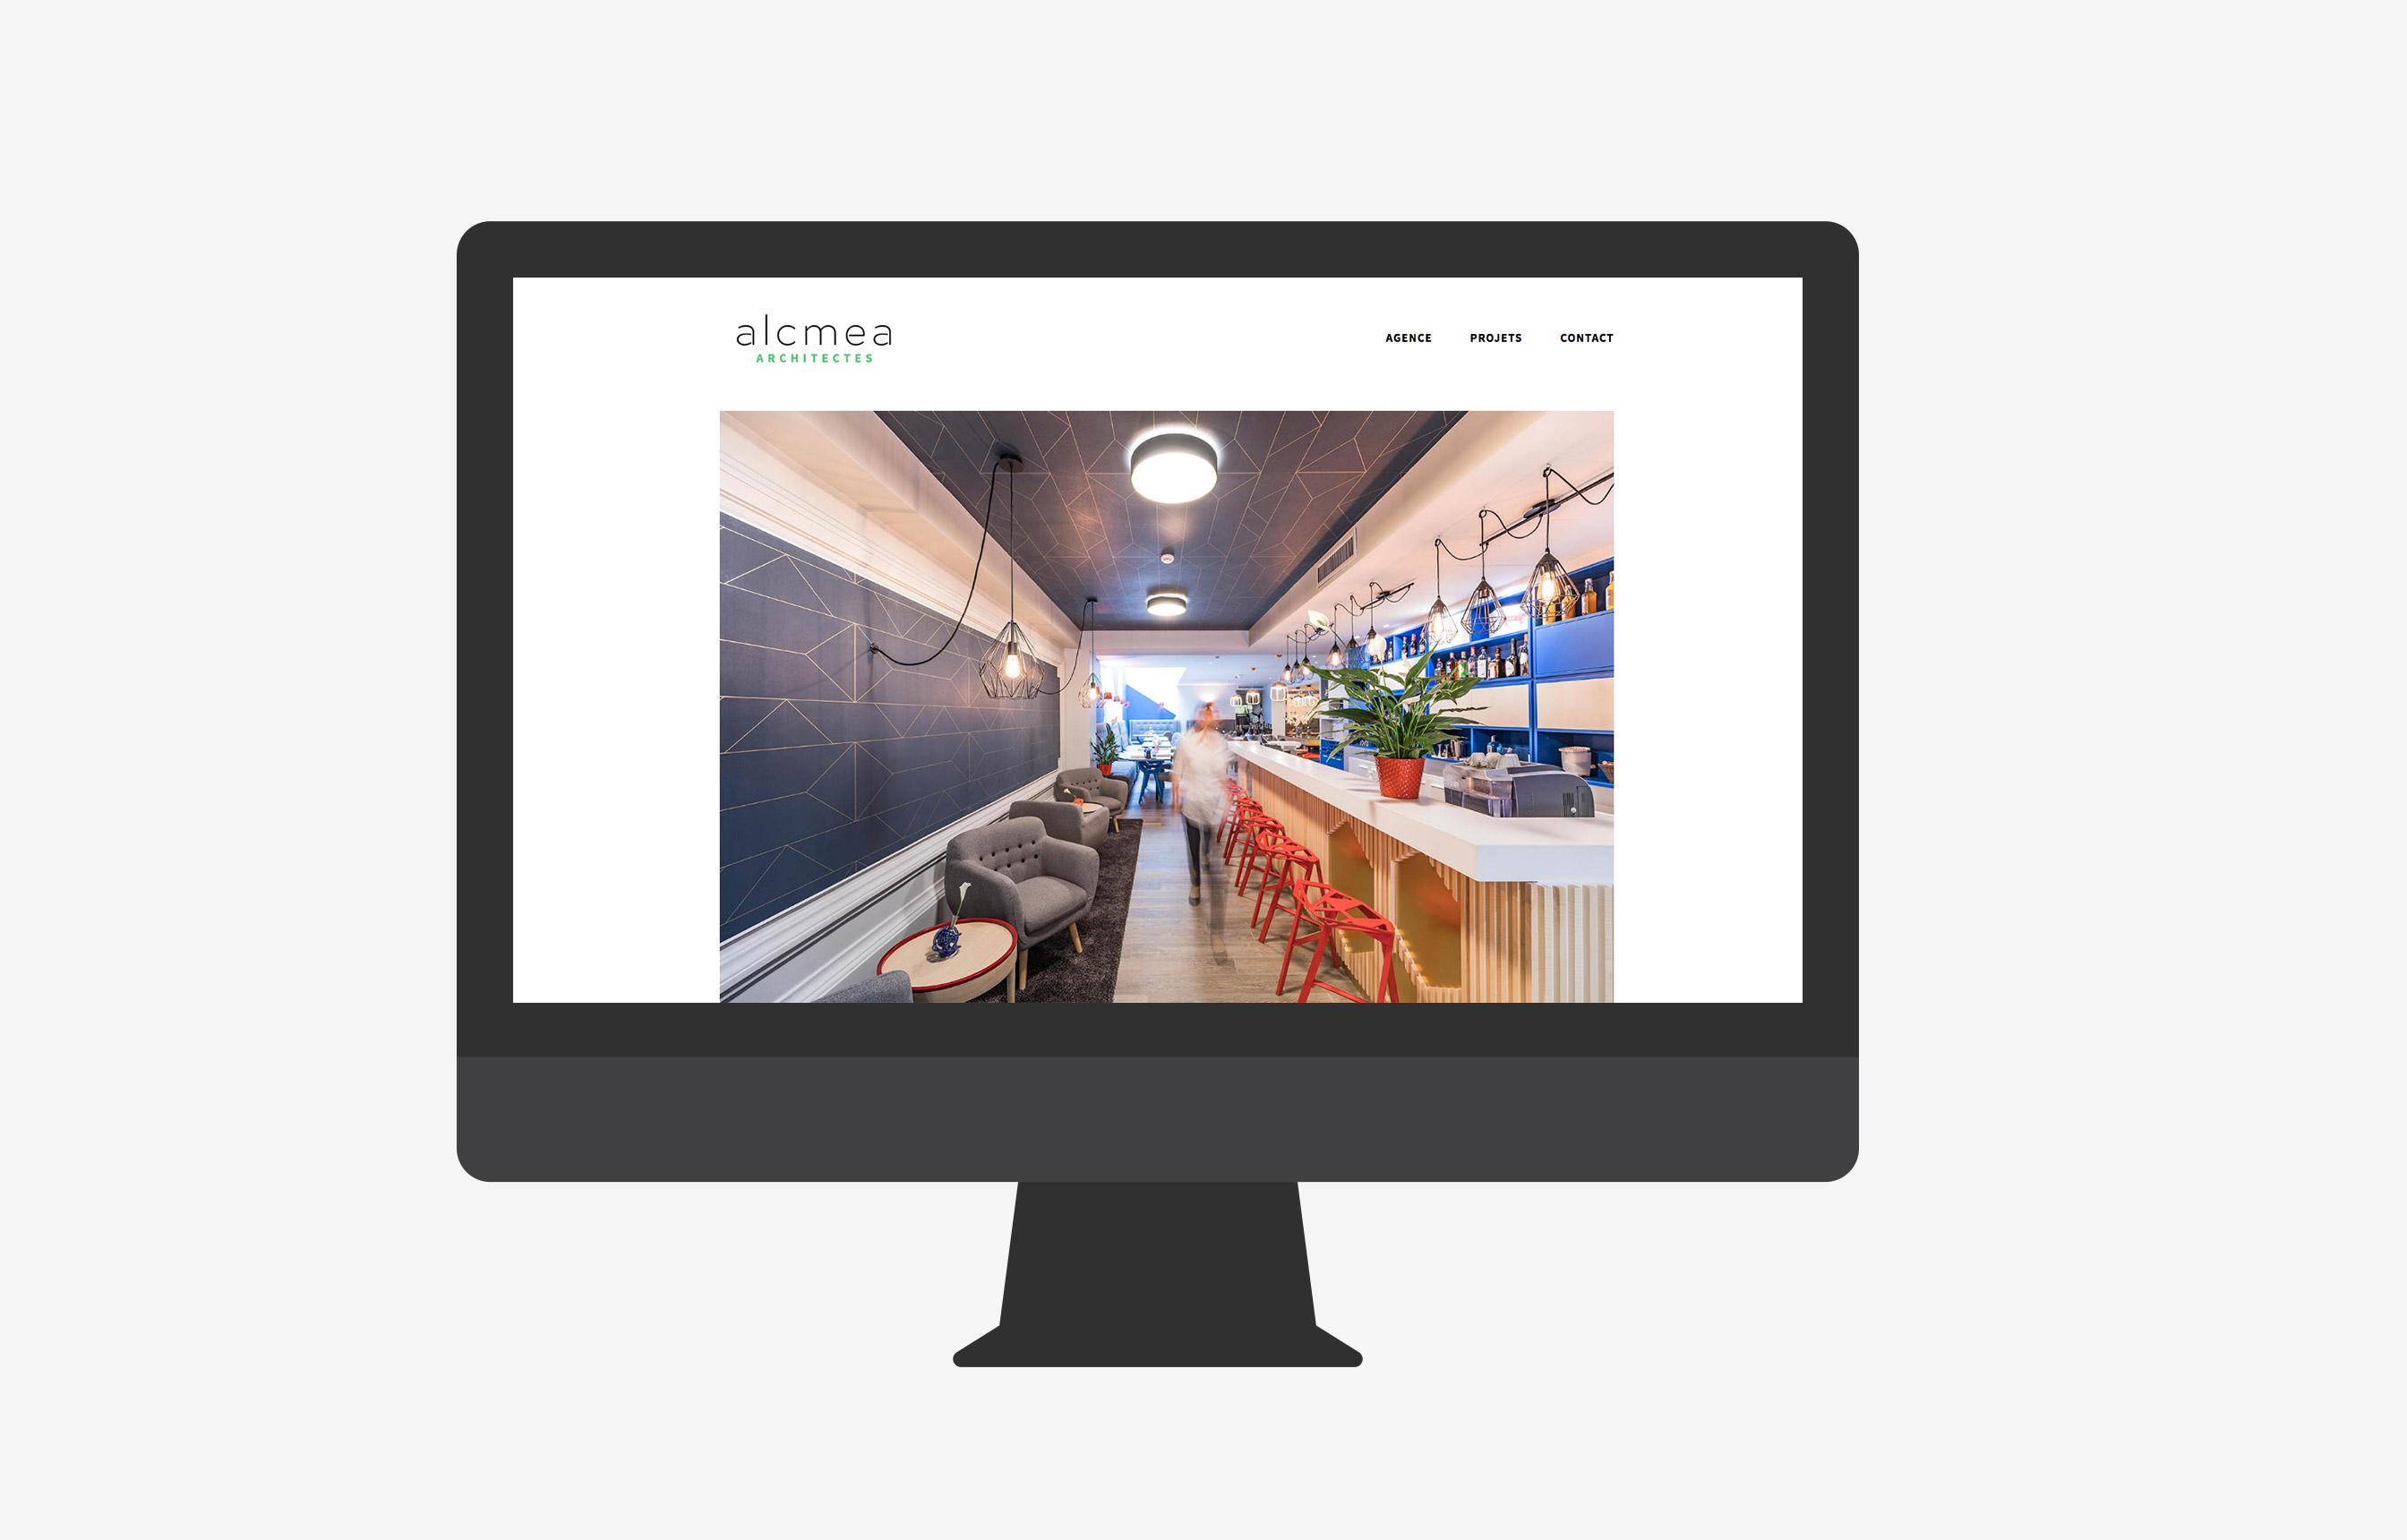 04-alcmea-pikteo-webdesign-graphic-design-freelance-paris-bruxelles-londres